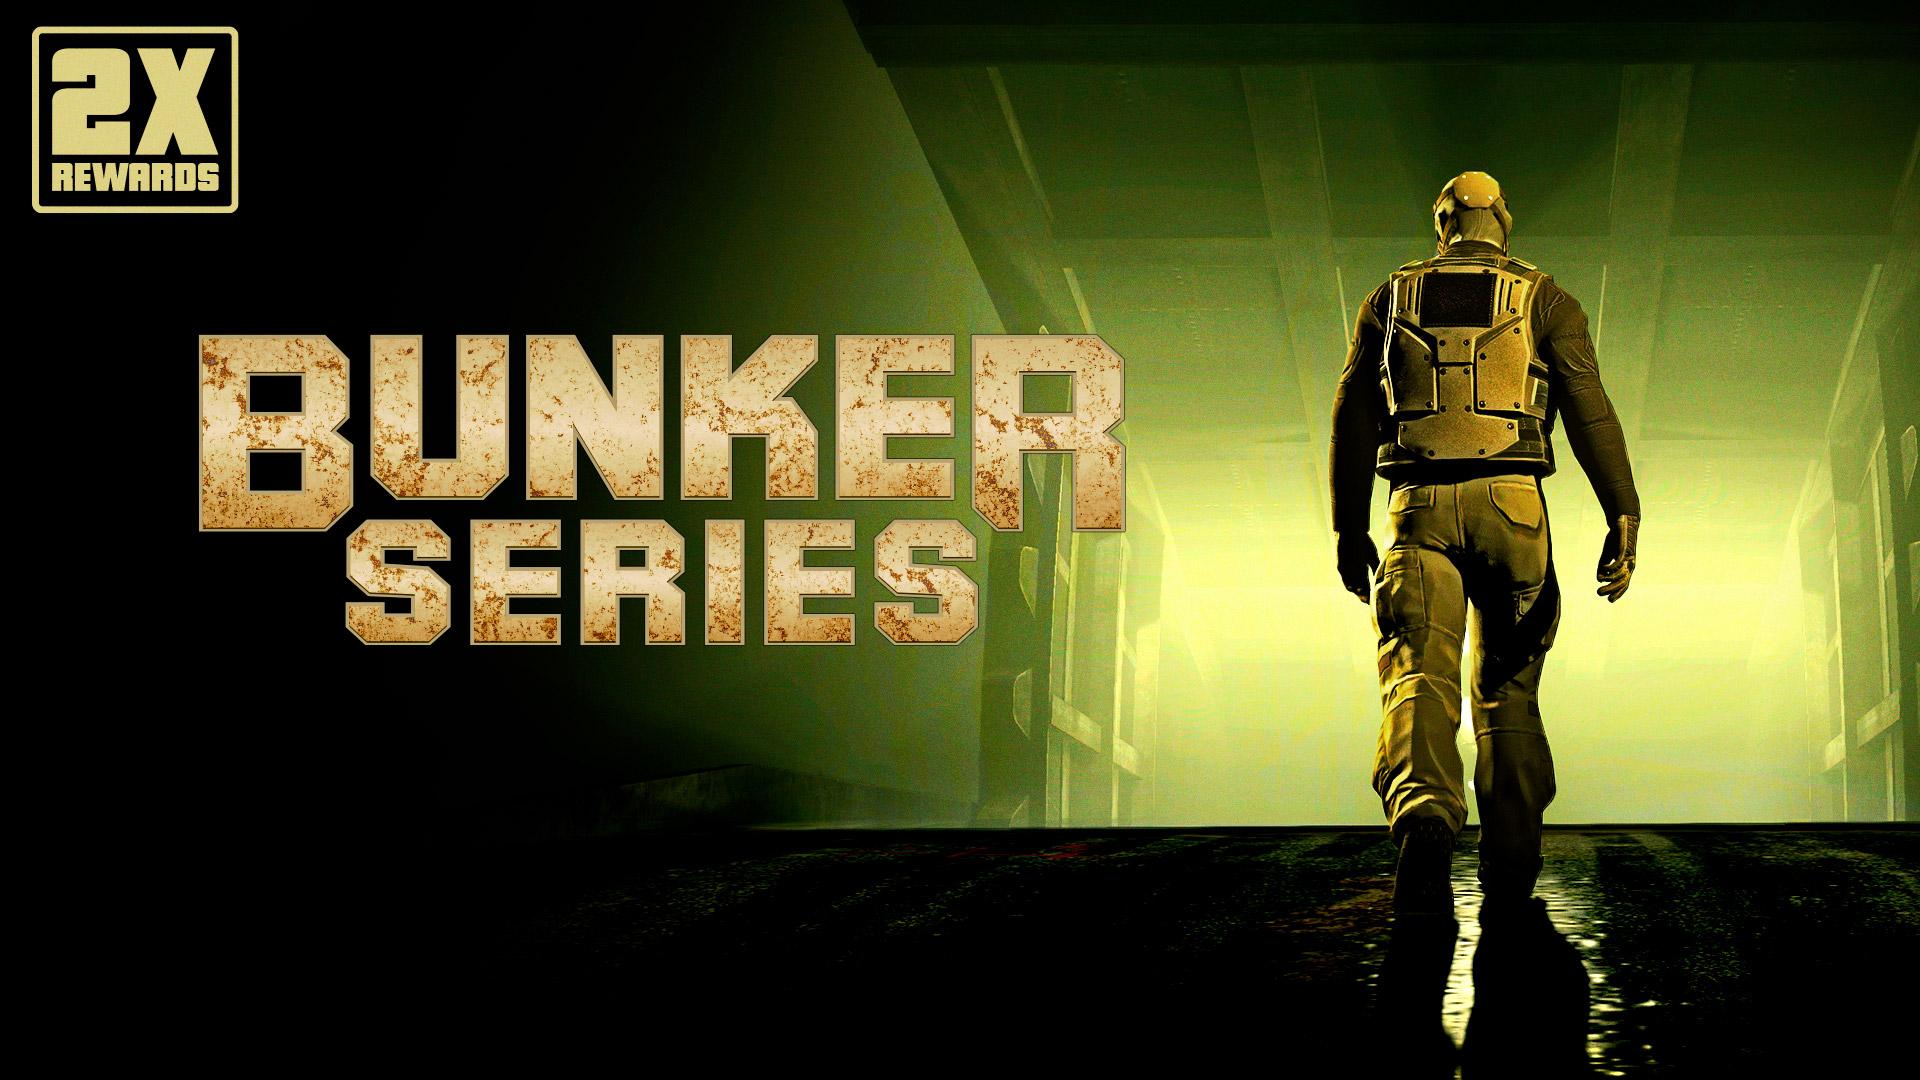 https://media.rockstargames.com/rockstargames-newsite/uploads/gtaonline/event199/bunker.jpg